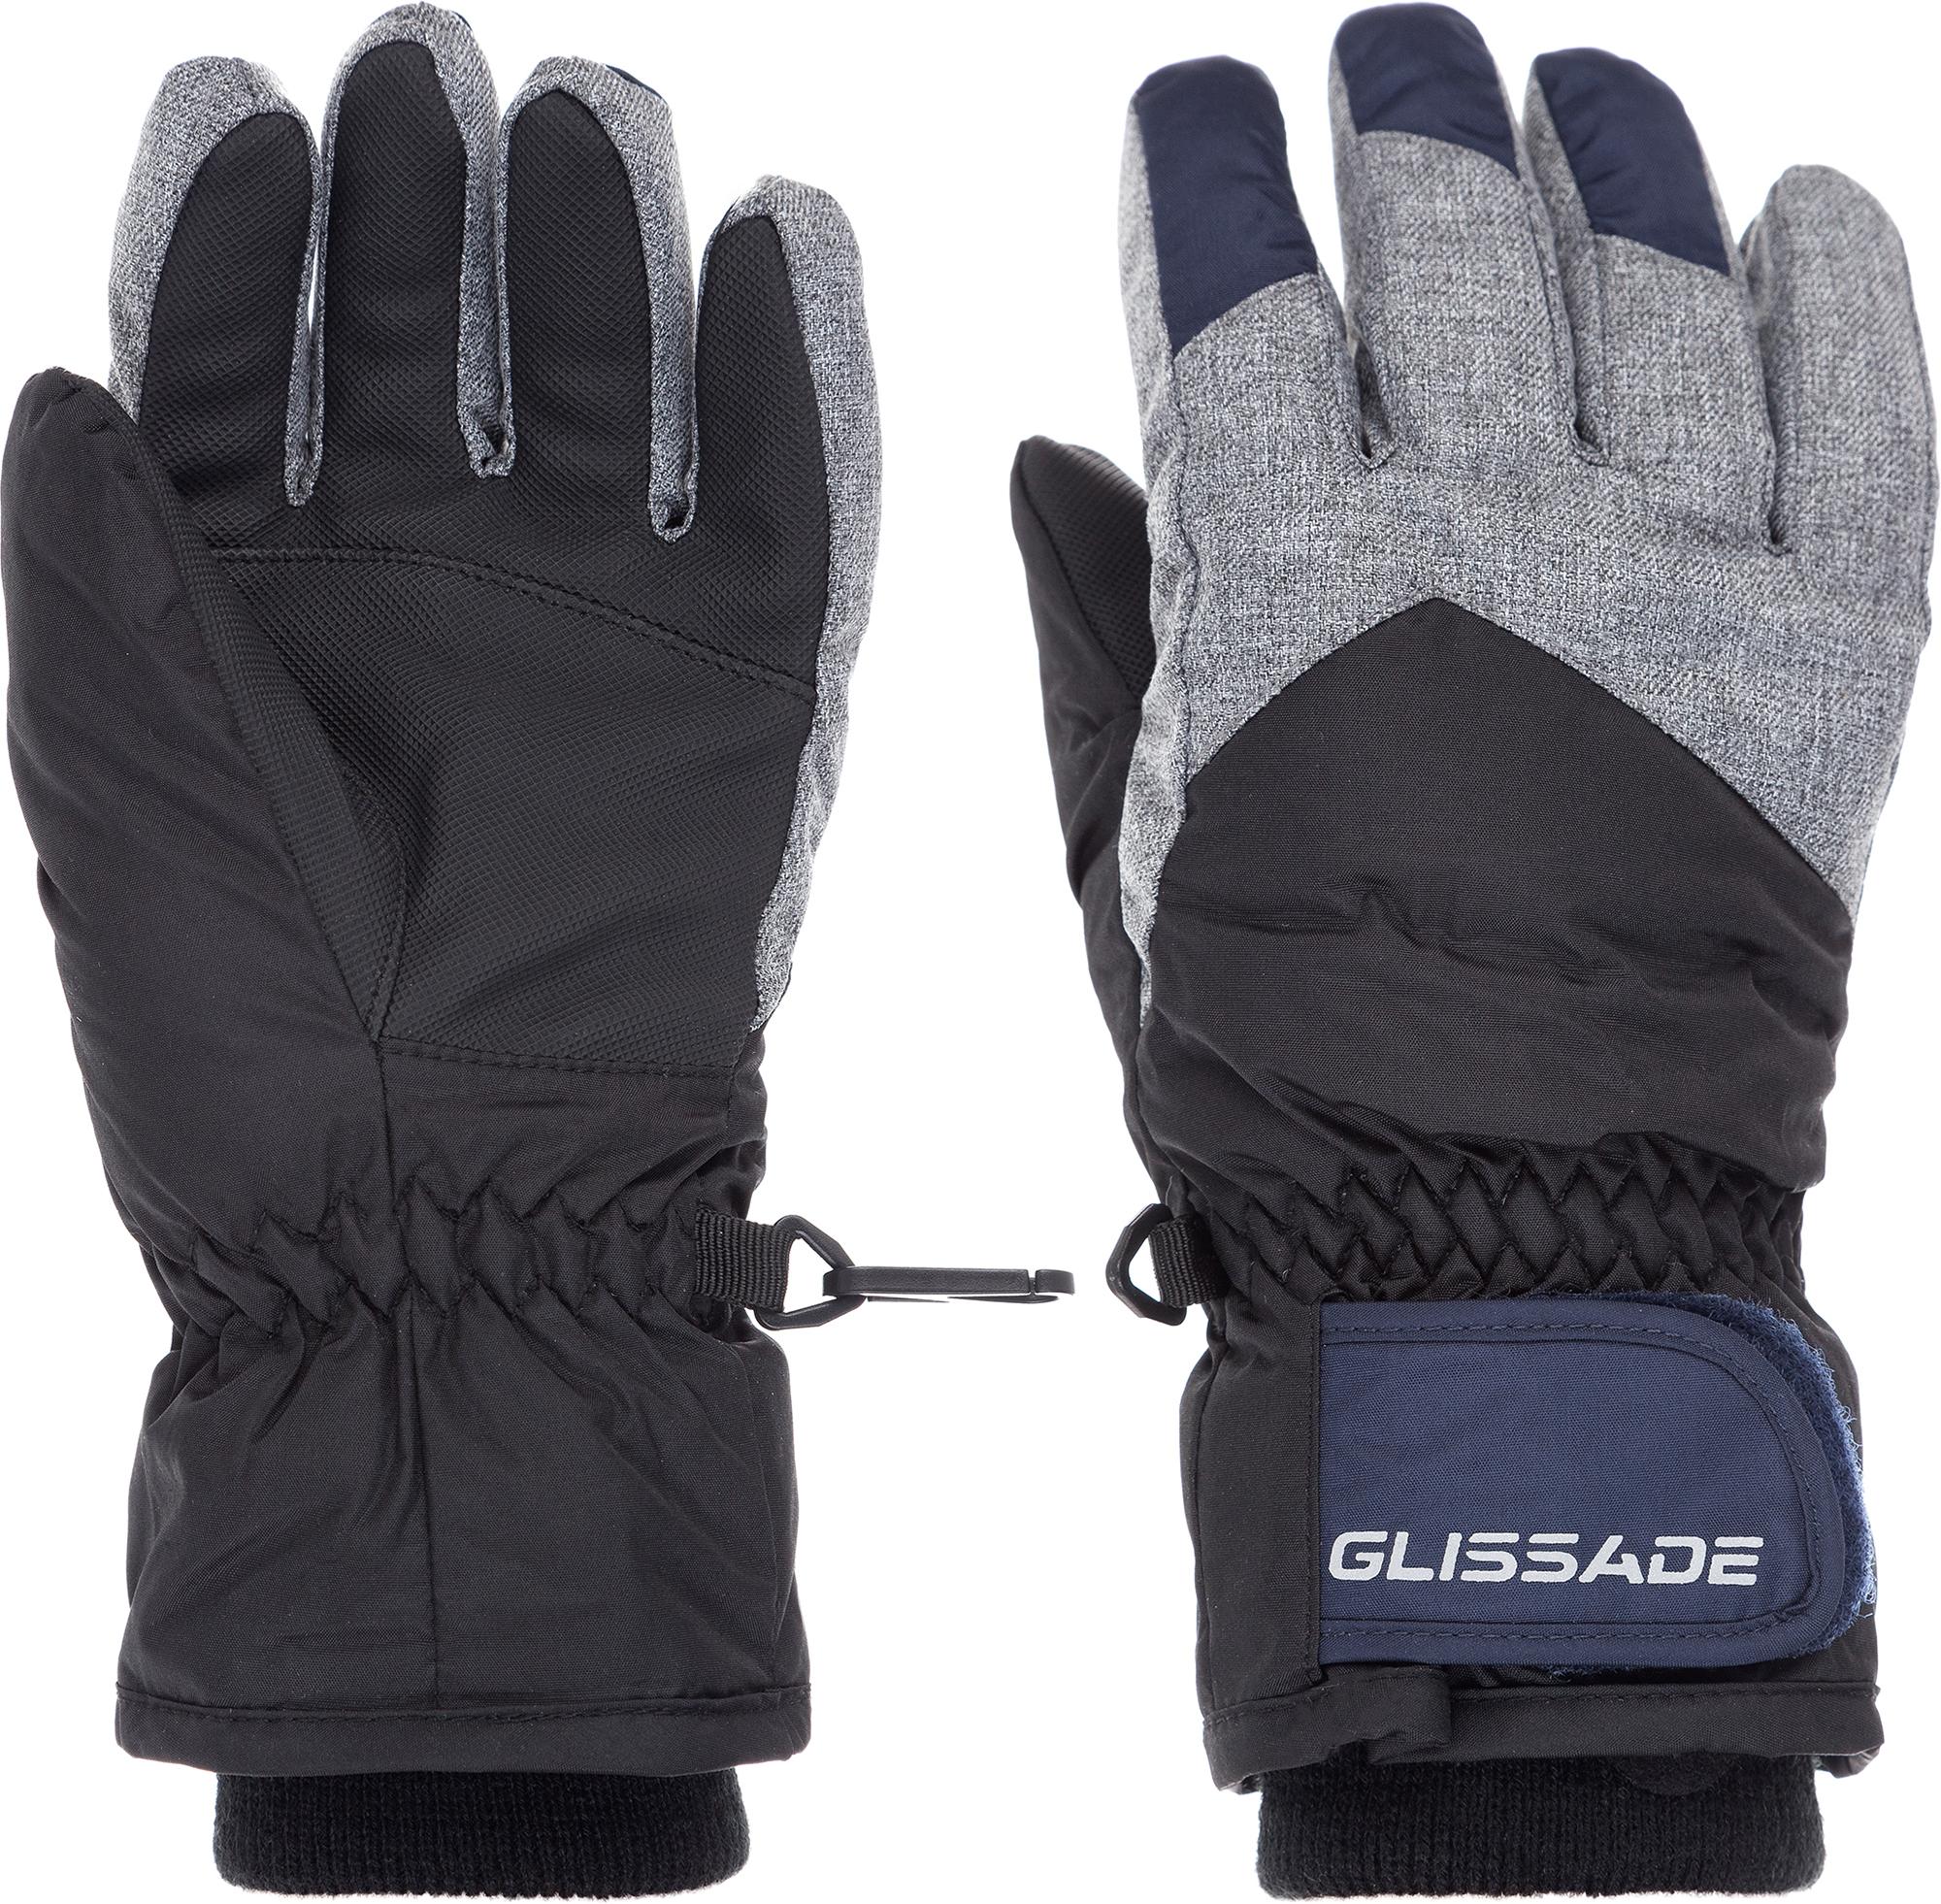 Glissade Перчатки для мальчиков Glissade glissade шапка для мальчиков glissade